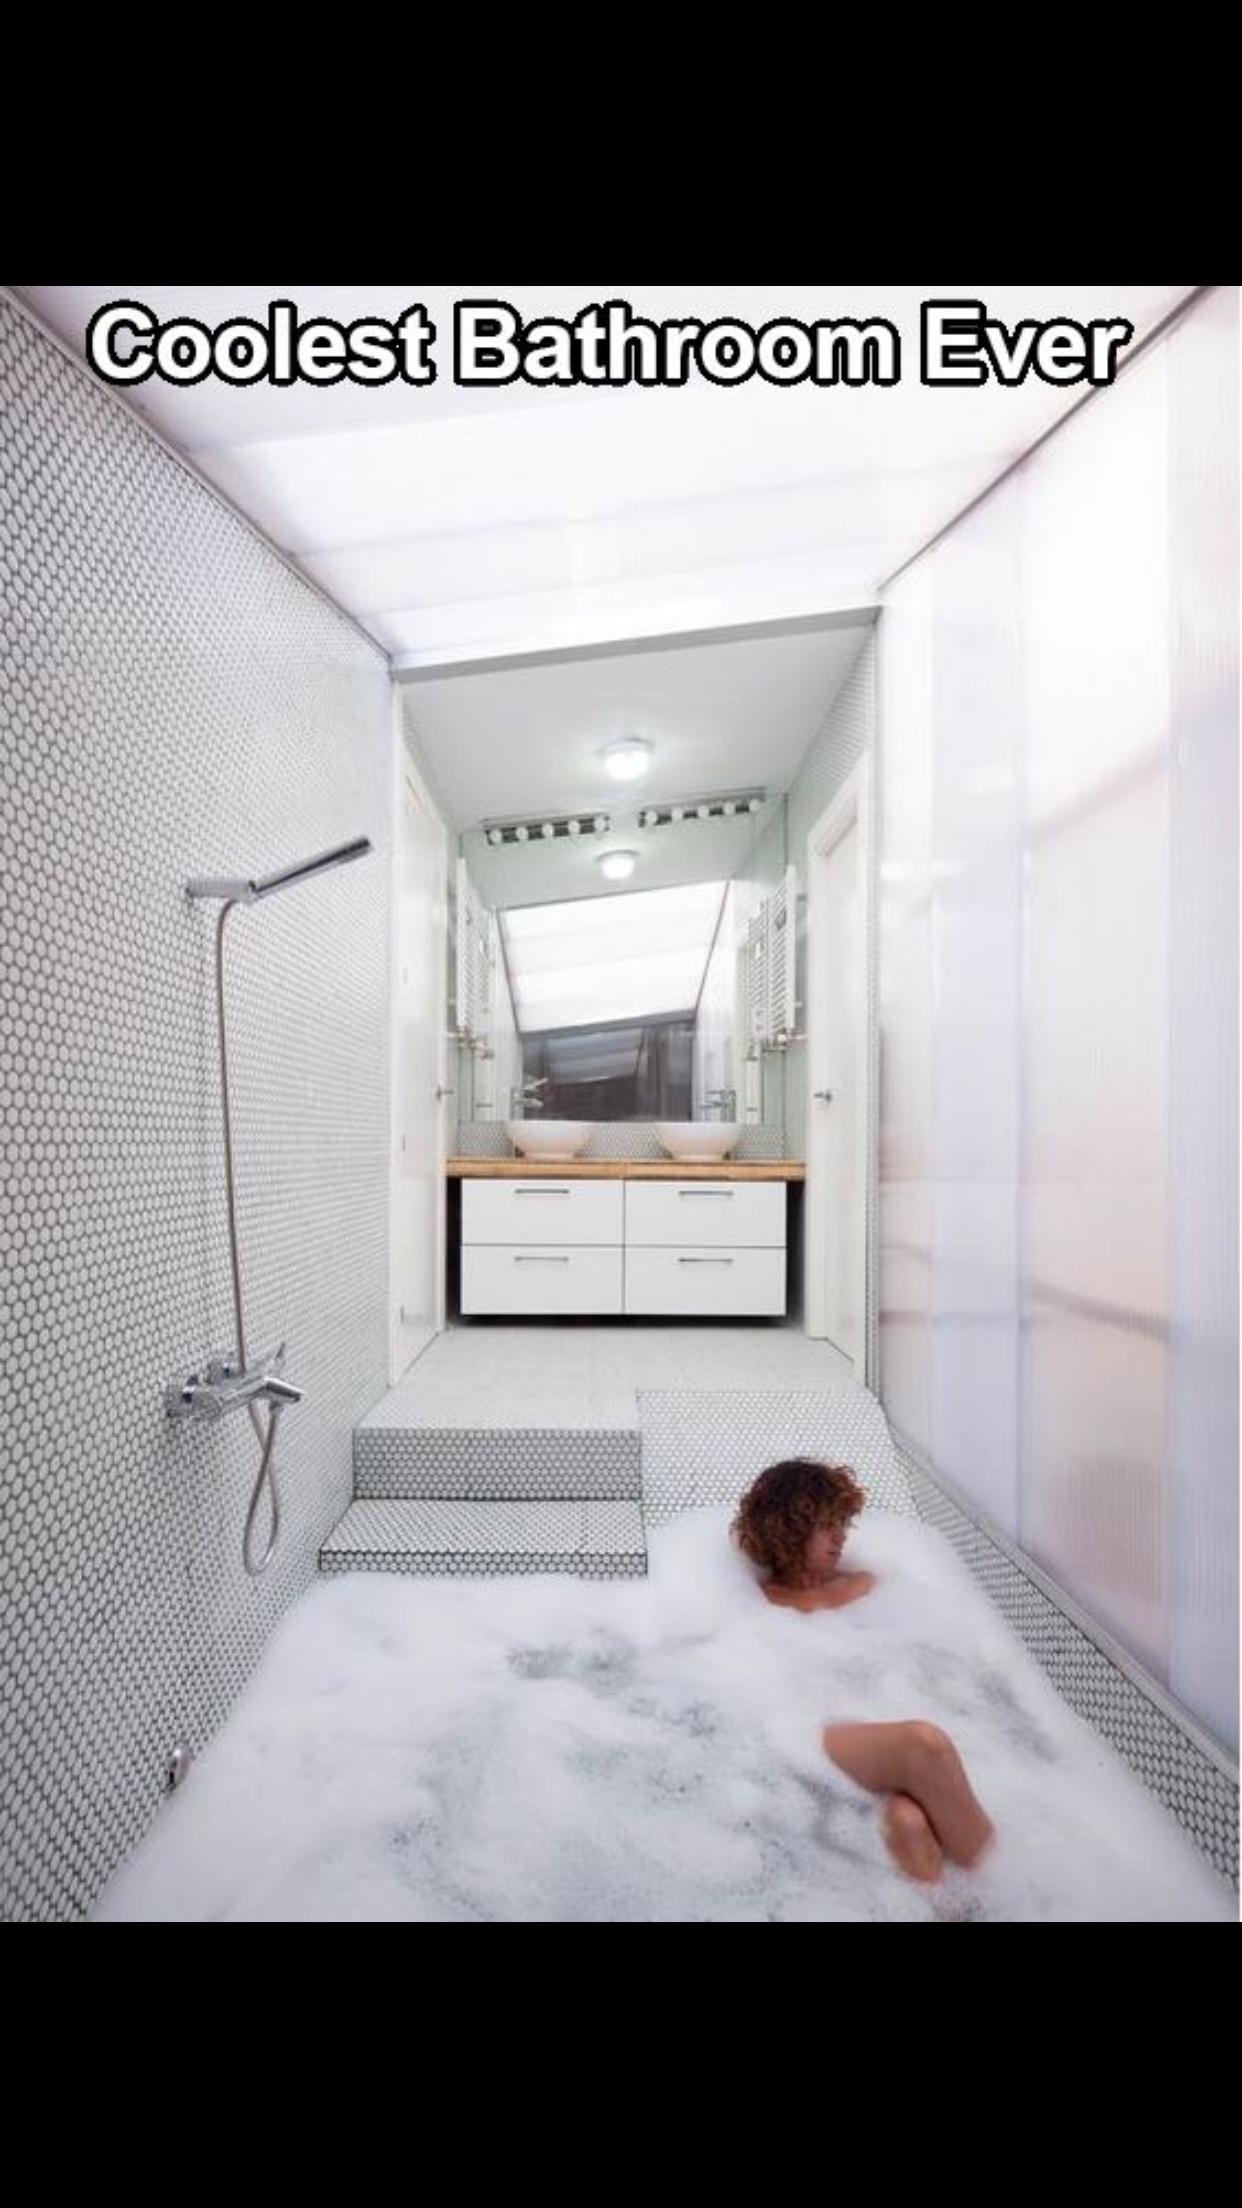 The perfect bathroom!